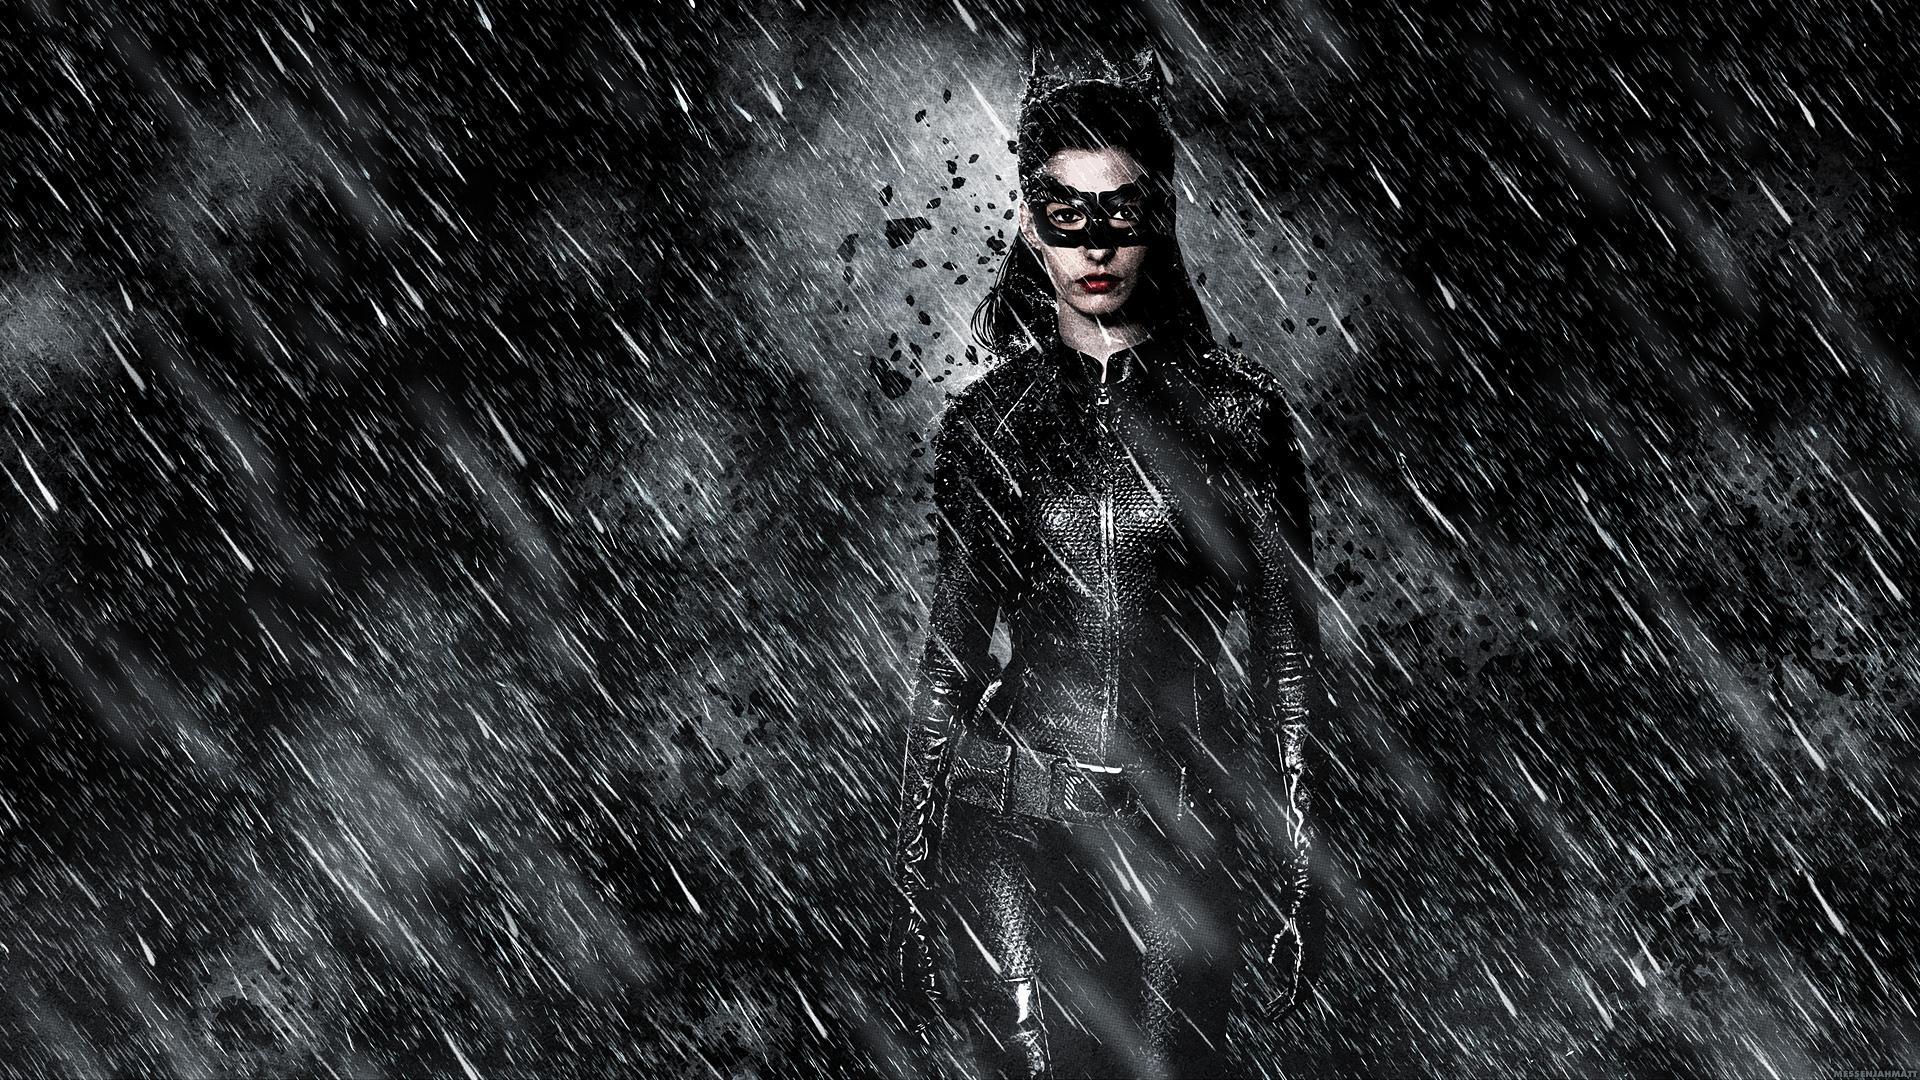 DARK KNIGHT RISES batman superhero catwoman rain wallpaper 1920x1080 1920x1080